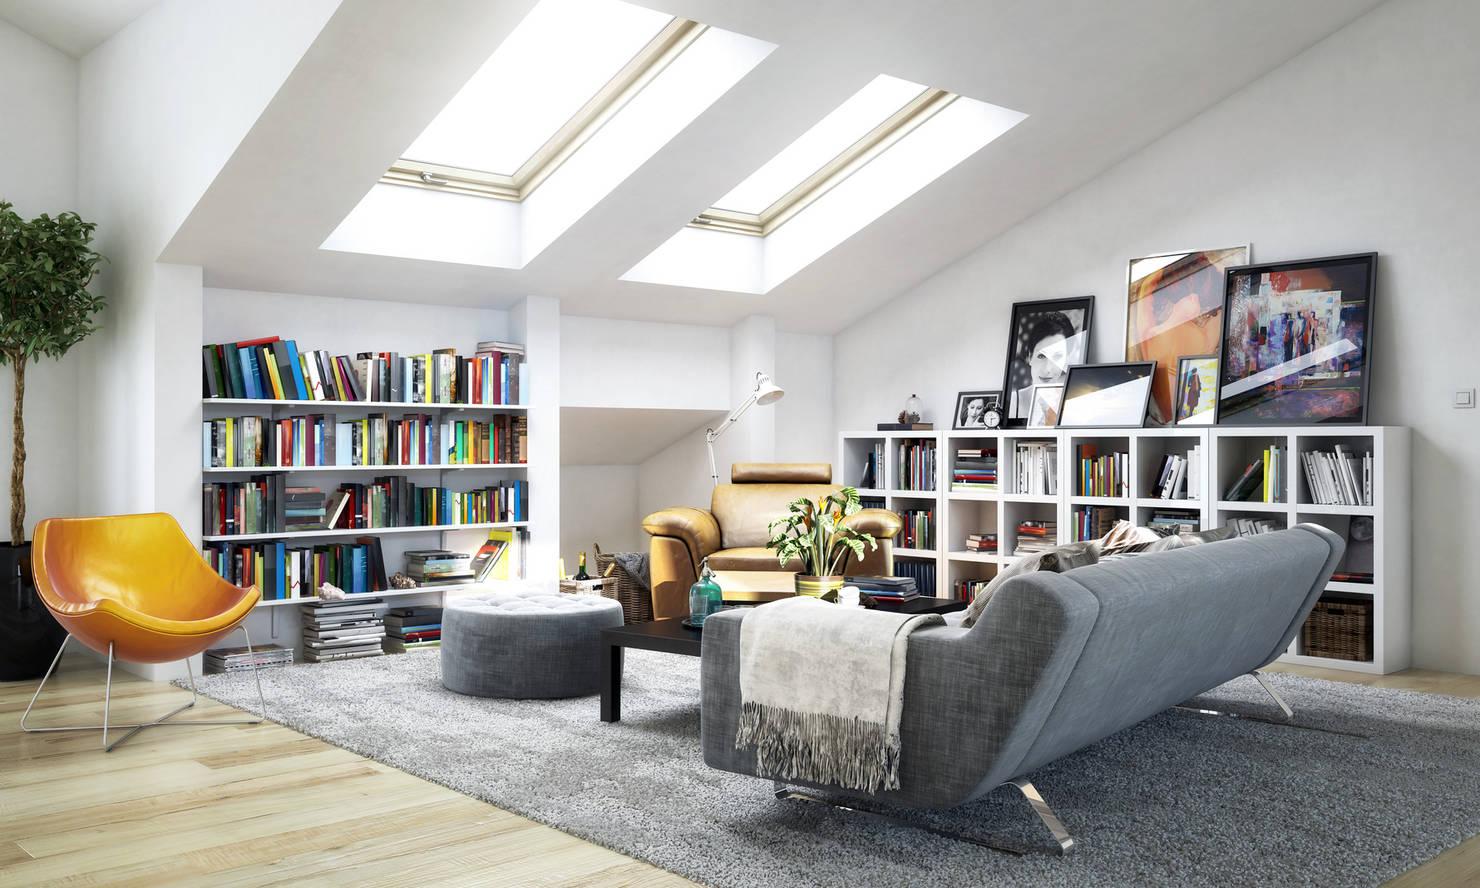 Dream attics: 9 inspiring examples